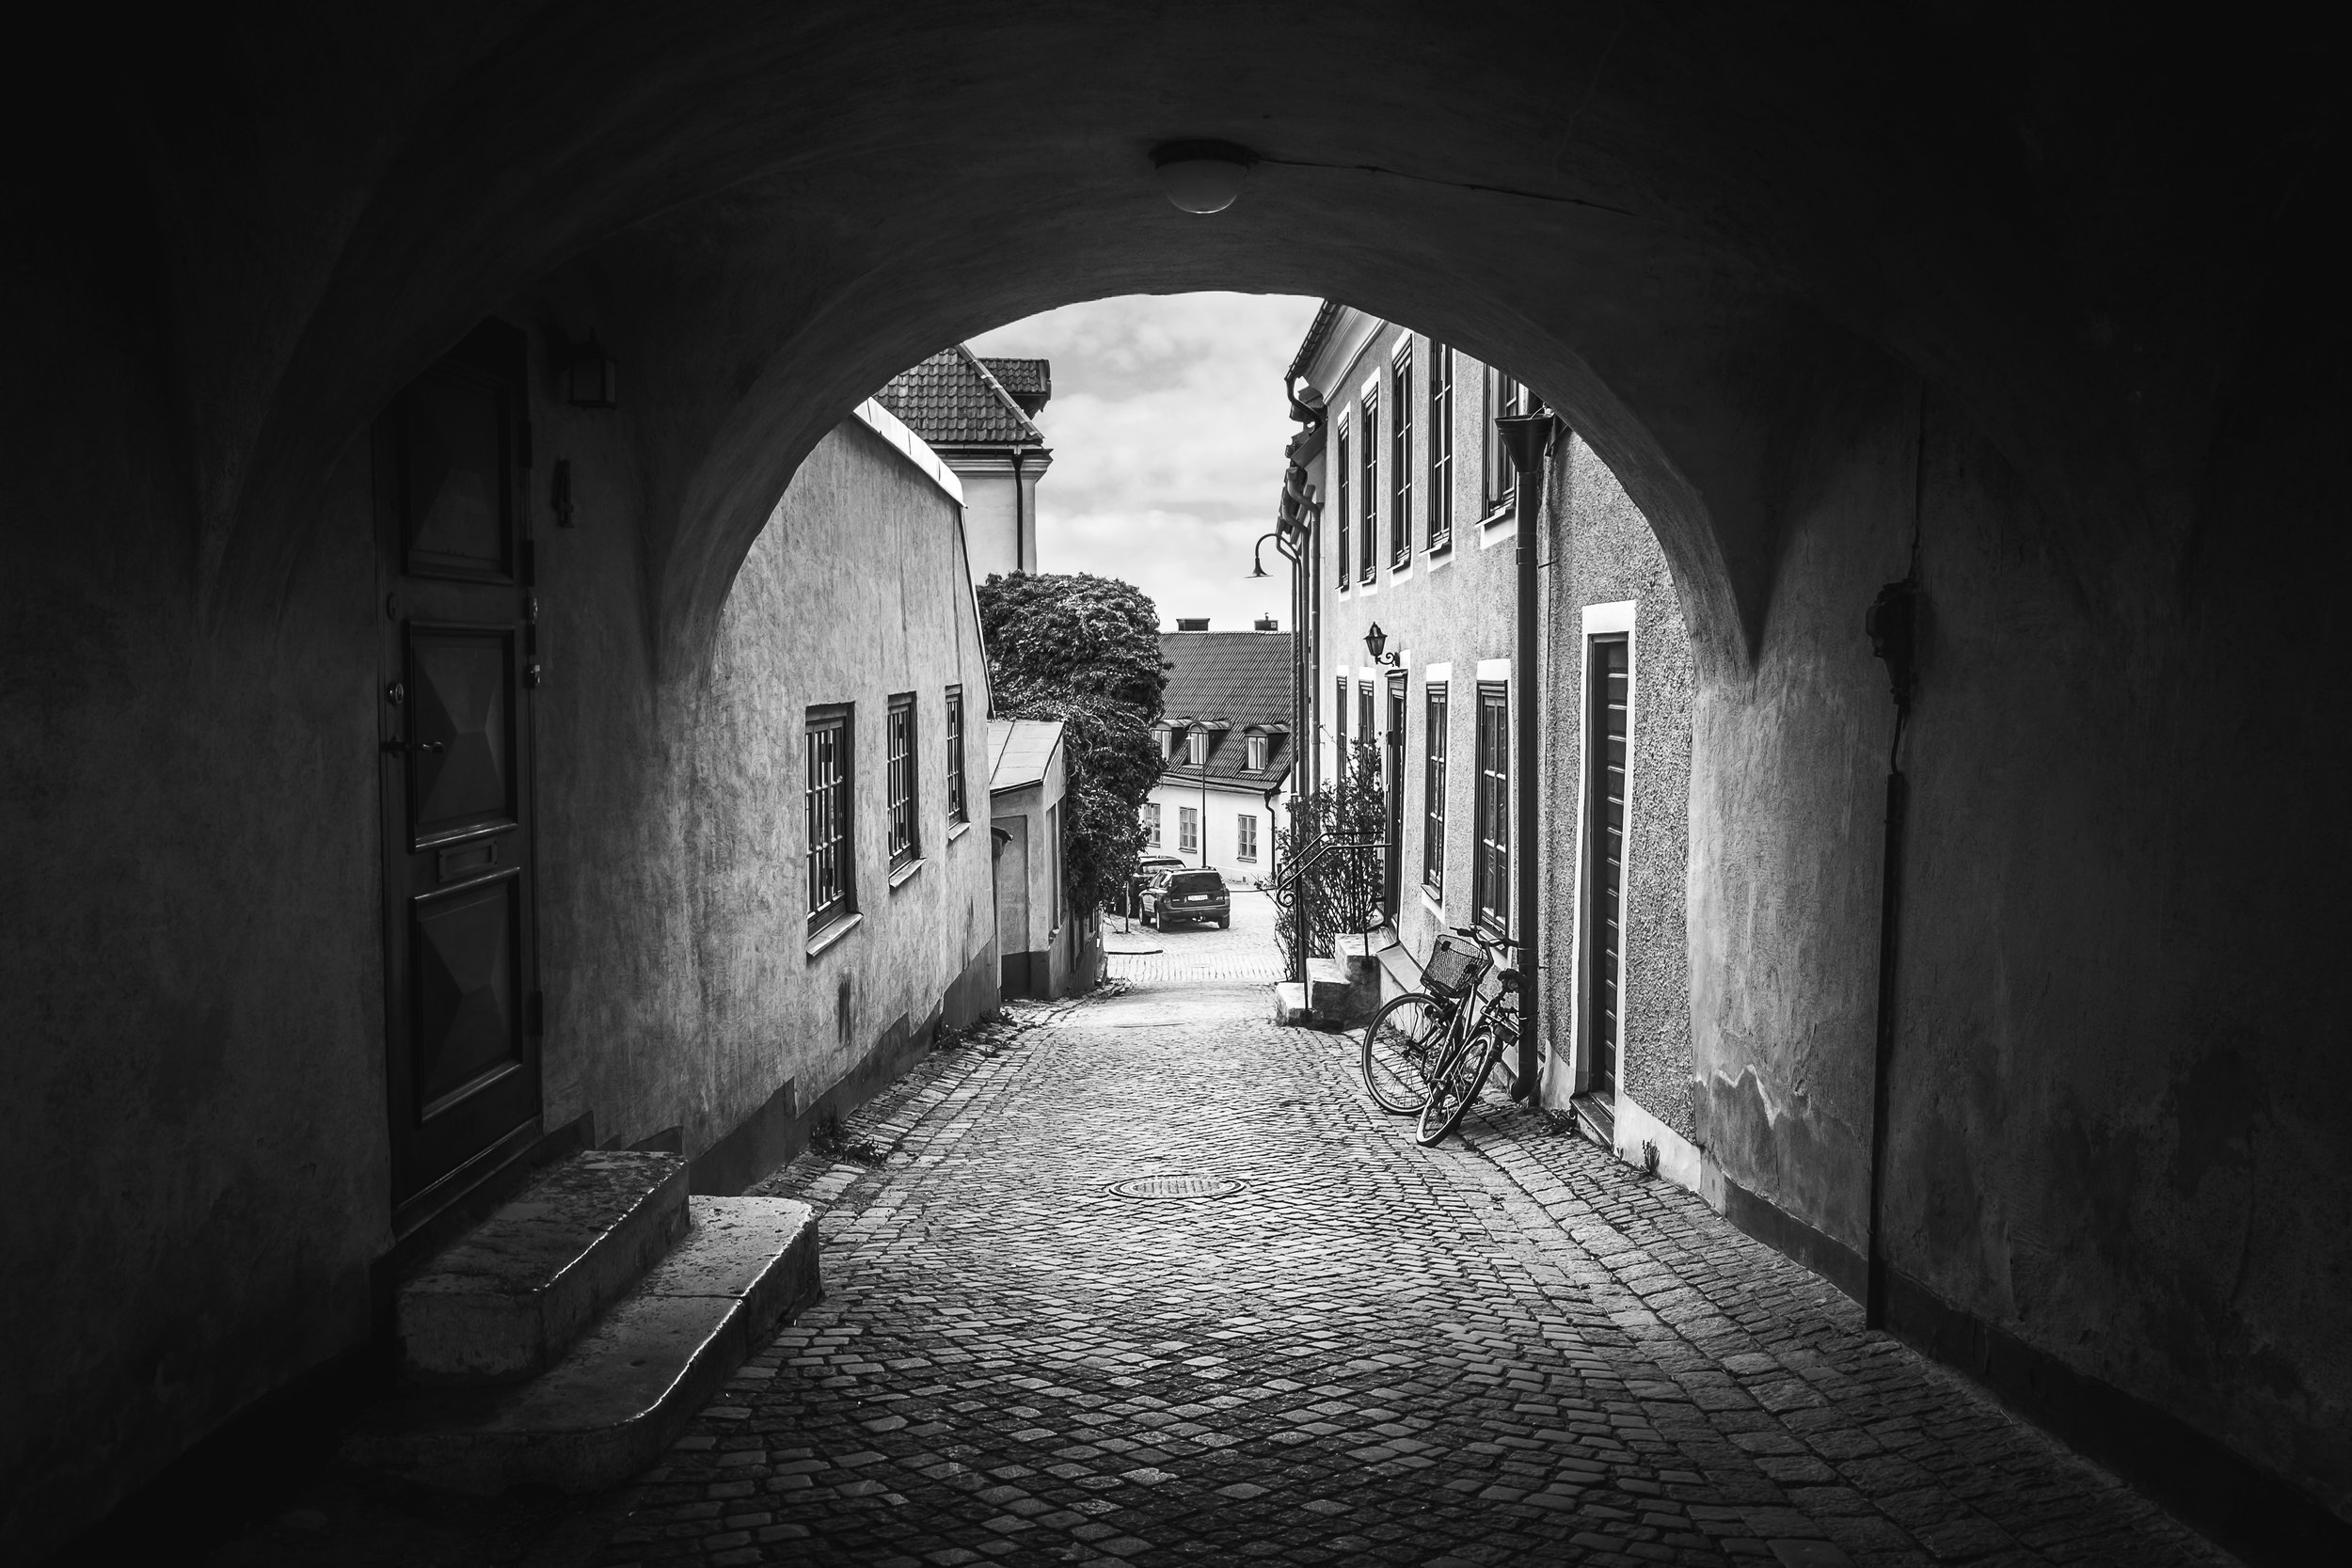 A beautiful little alley